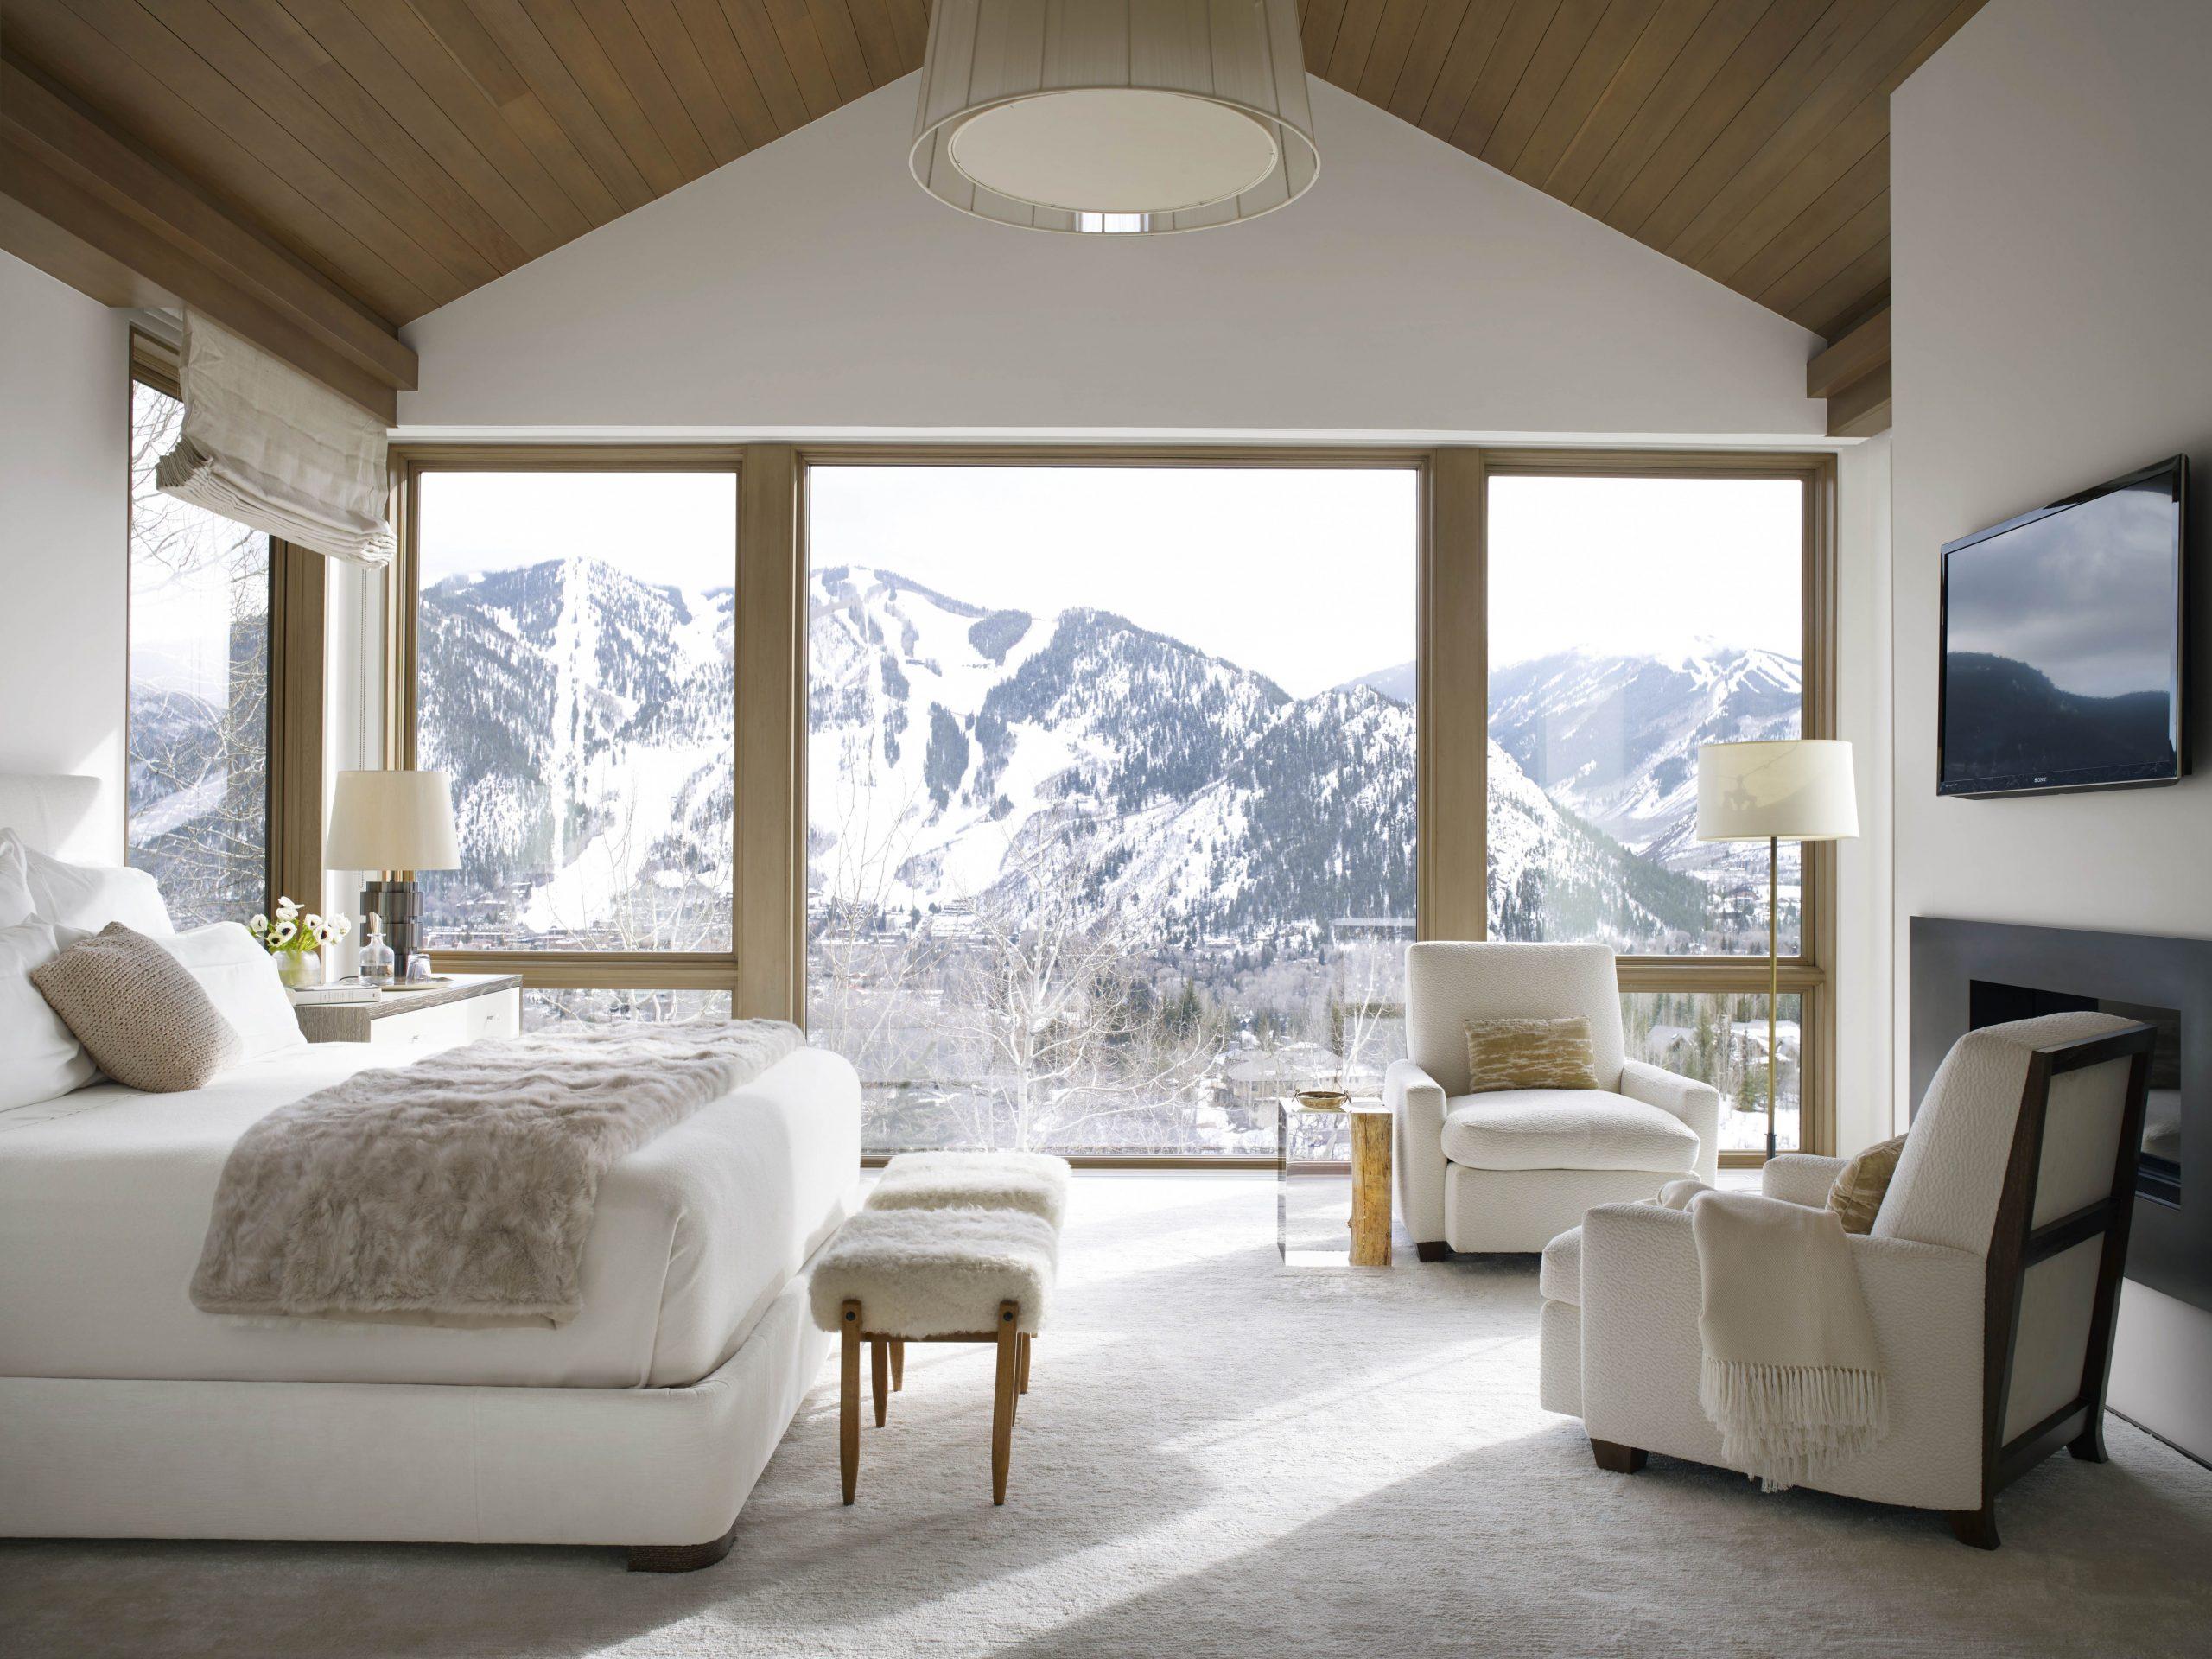 11 White Bedroom Ideas - Luxury White Bedroom Designs and Decor - Bedroom Ideas Design